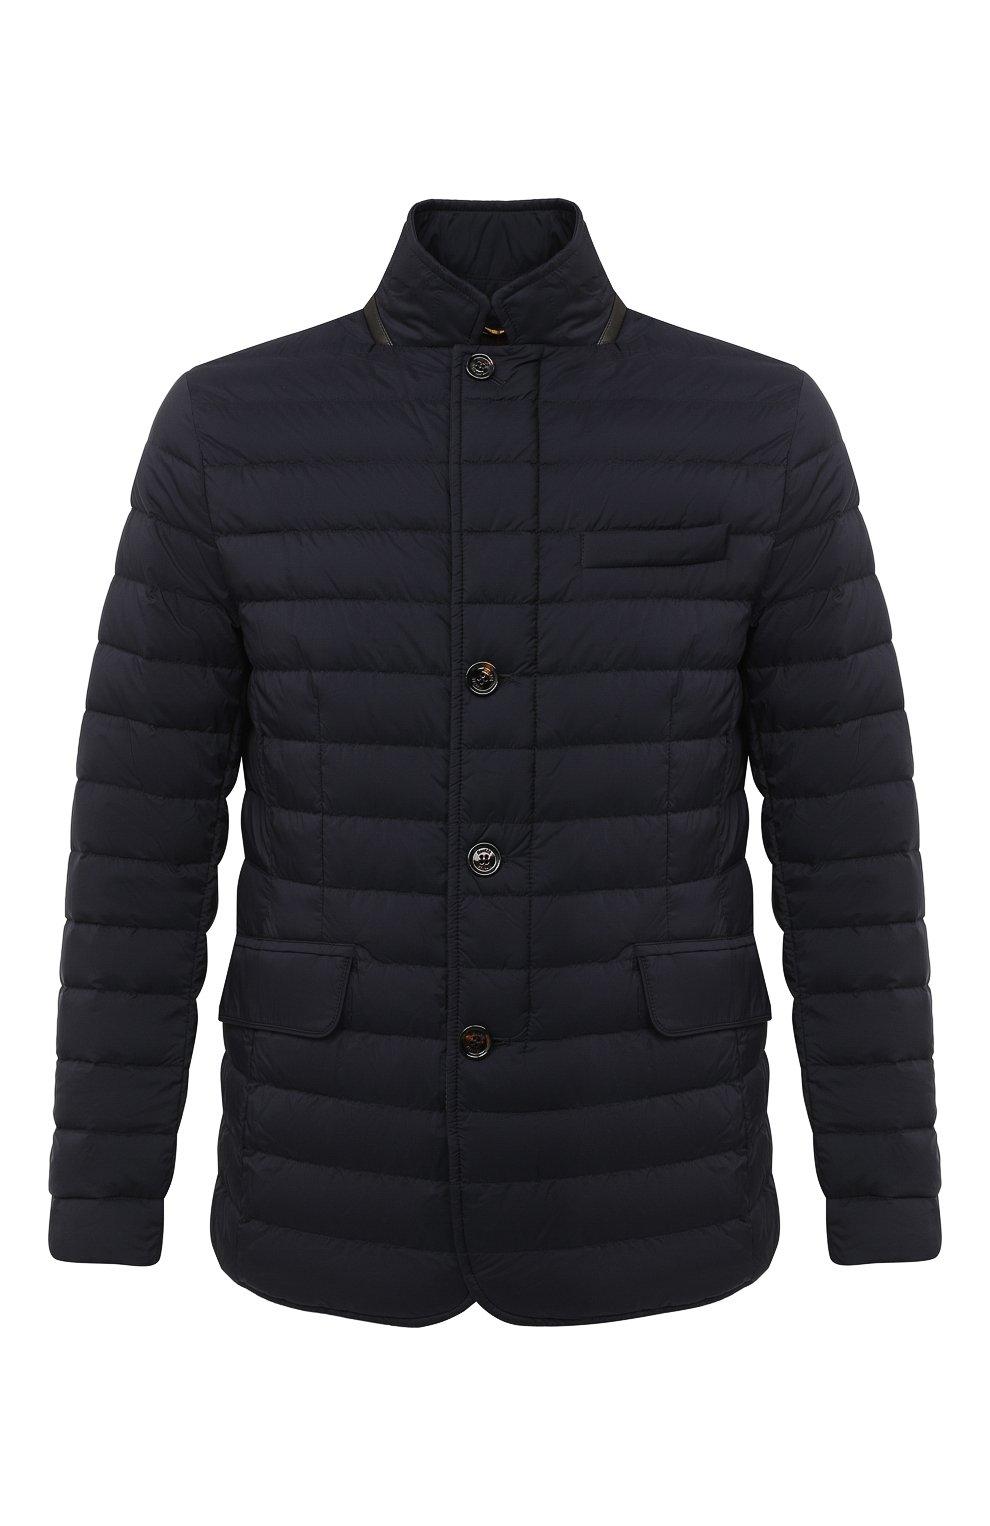 Мужская пуховая куртка zavyer-s3 MOORER темно-синего цвета, арт. ZAVYER-S3/A20M360REFL   Фото 1